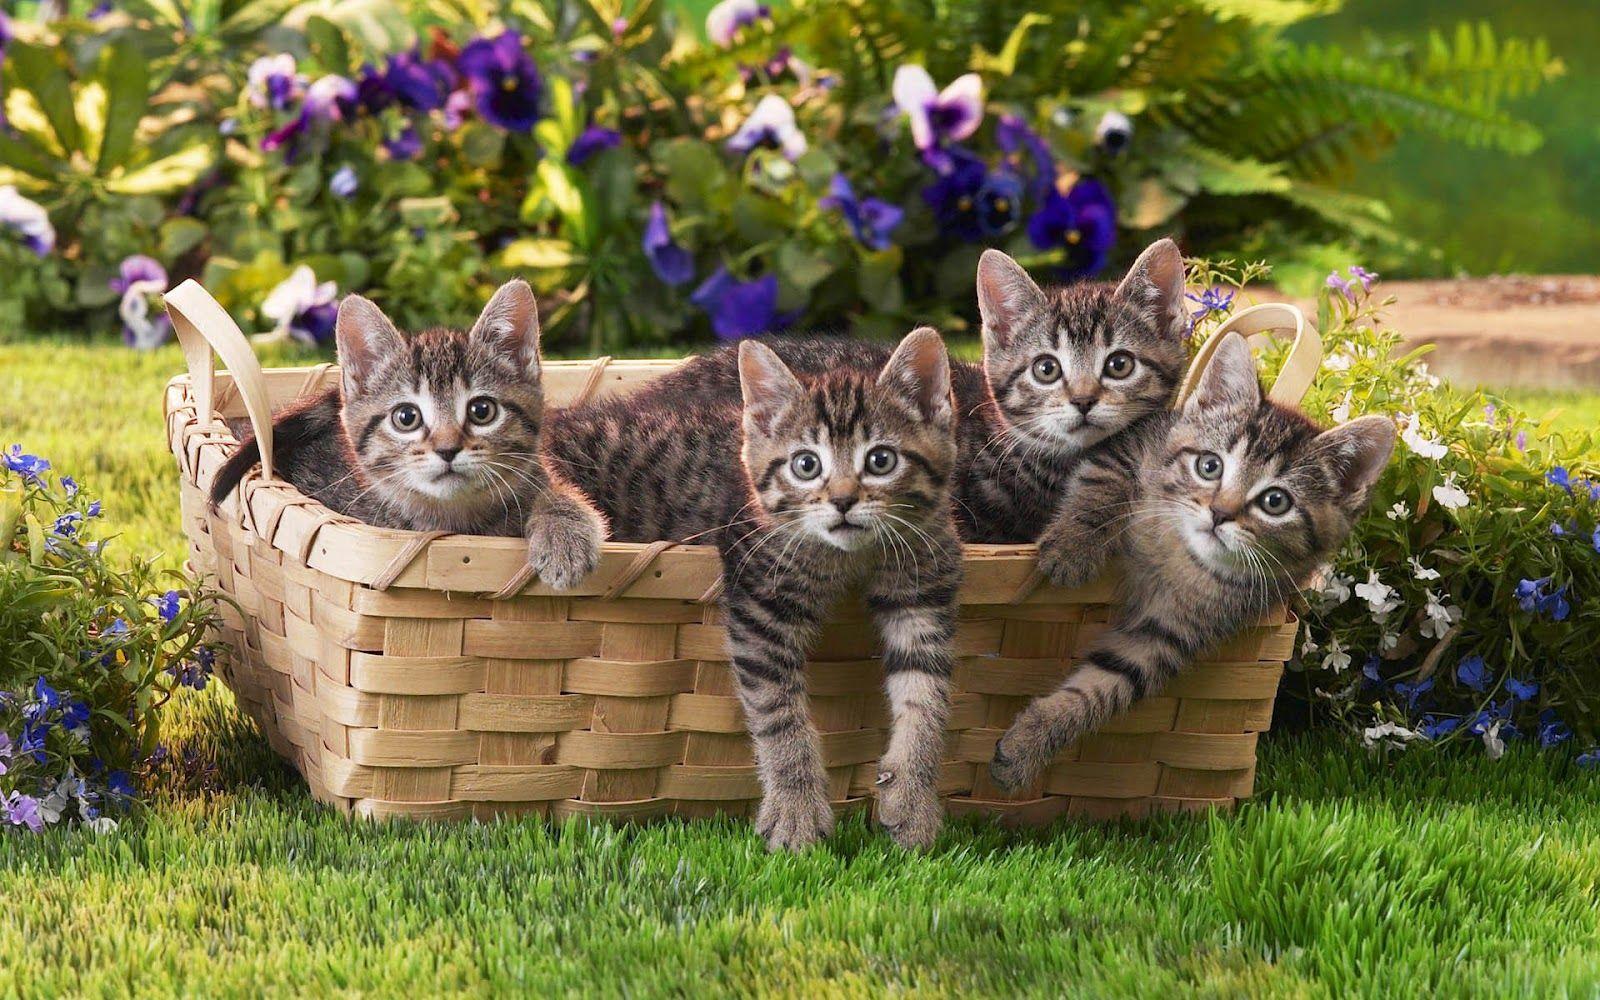 Kittens Wallpaper Cute Kitten Wallpaper Kitten Wallpaper Kittens Cutest Cute Animals